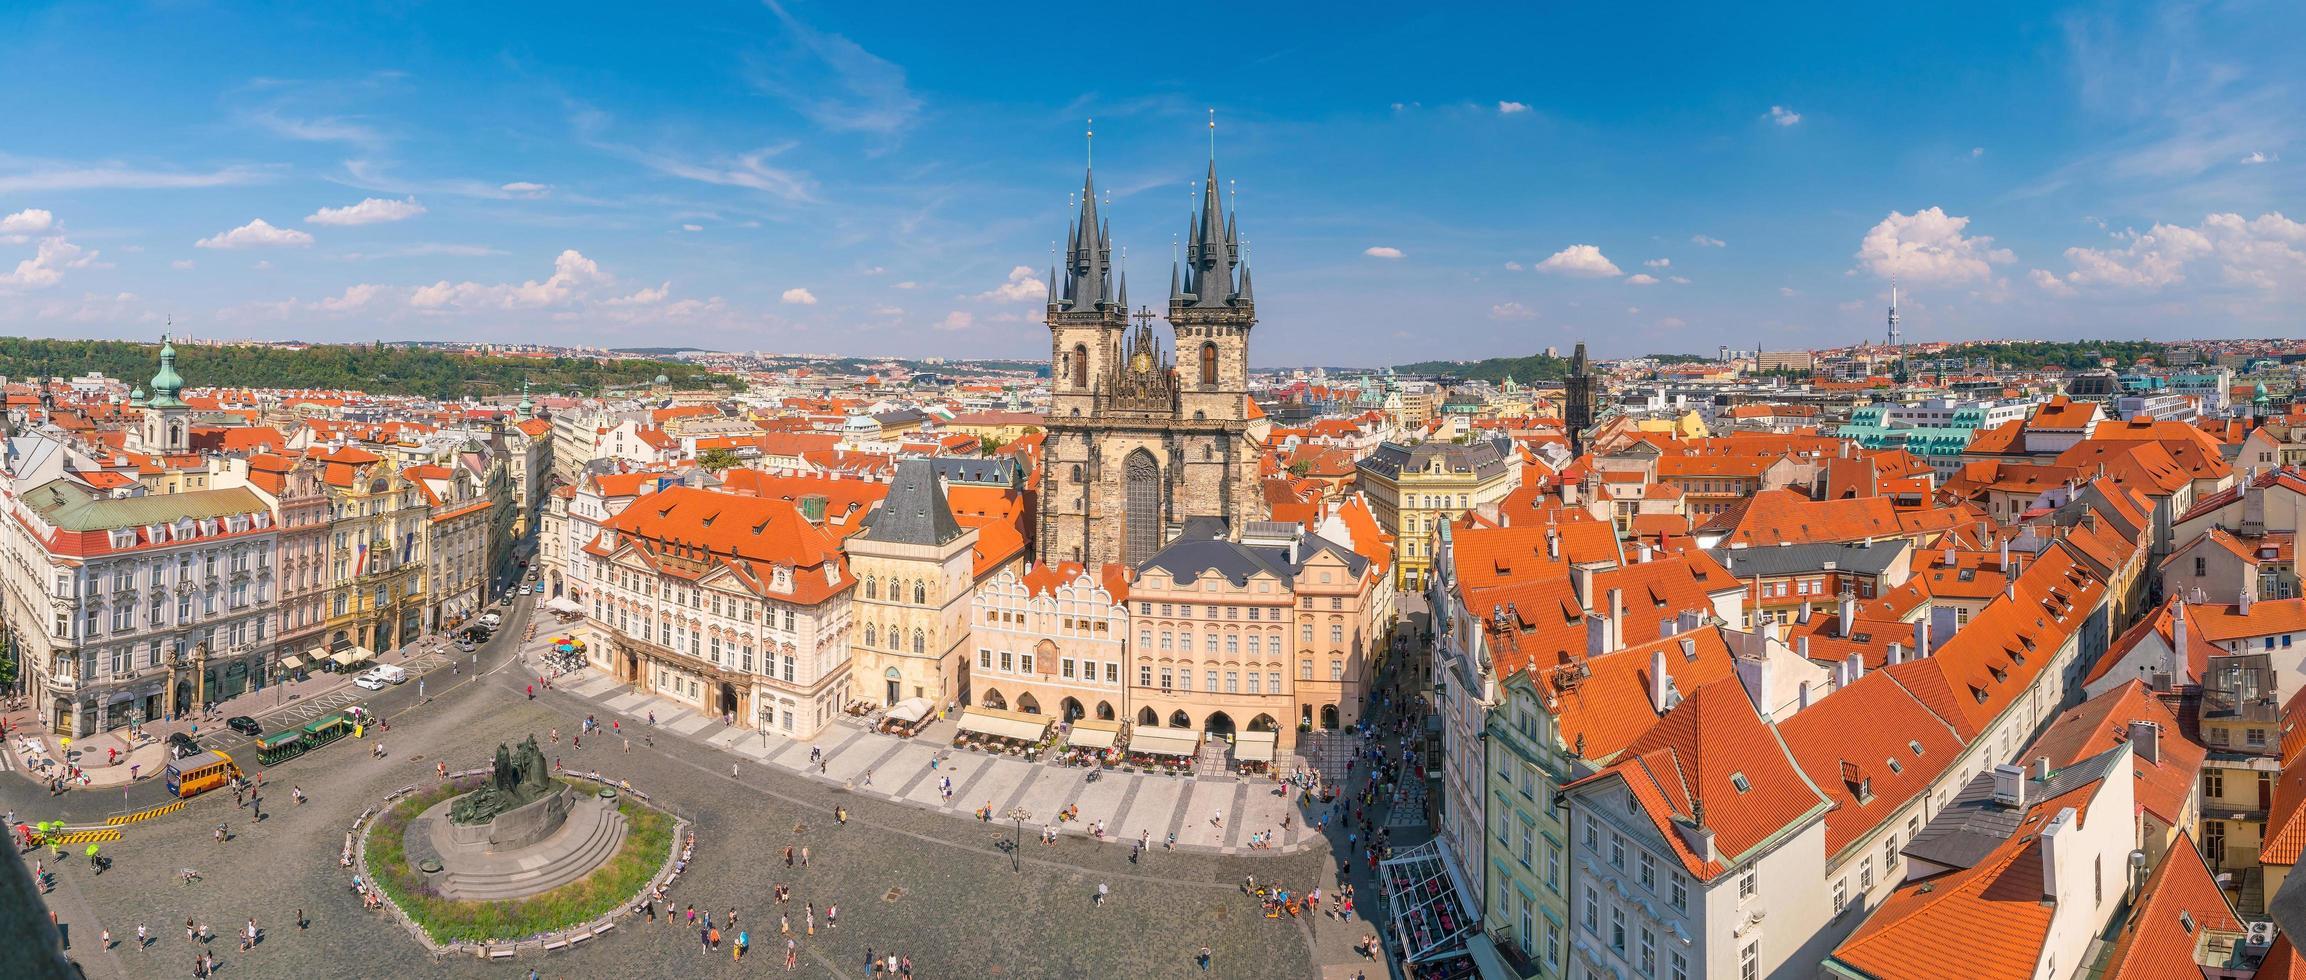 Old Town Square, Czech Republic photo